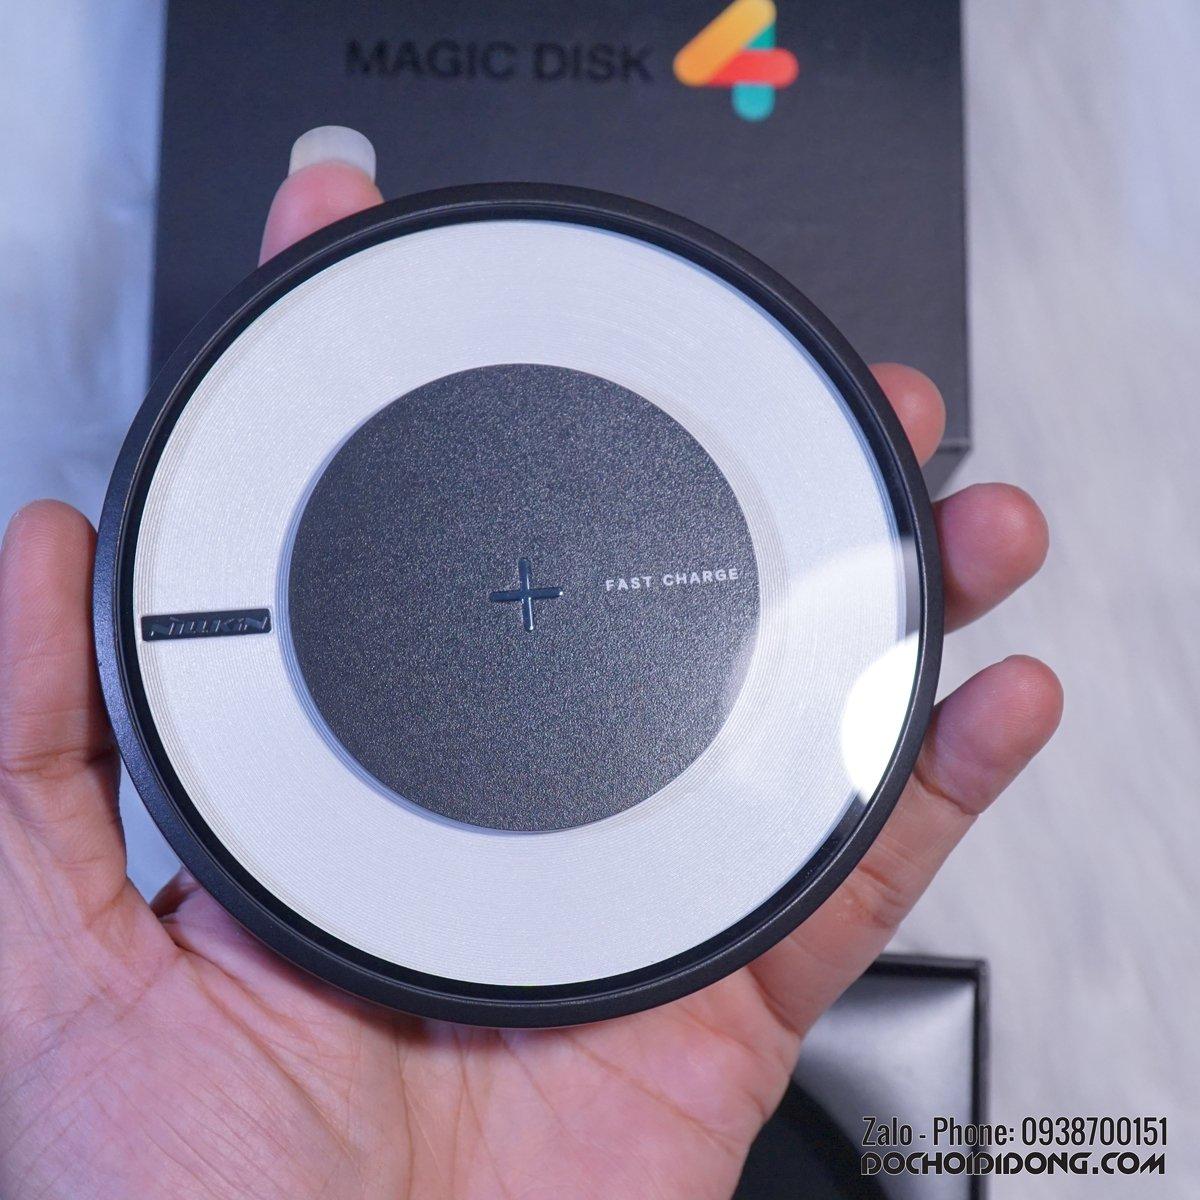 sac-khong-day-nillkin-magic-disk-4-fast-charge